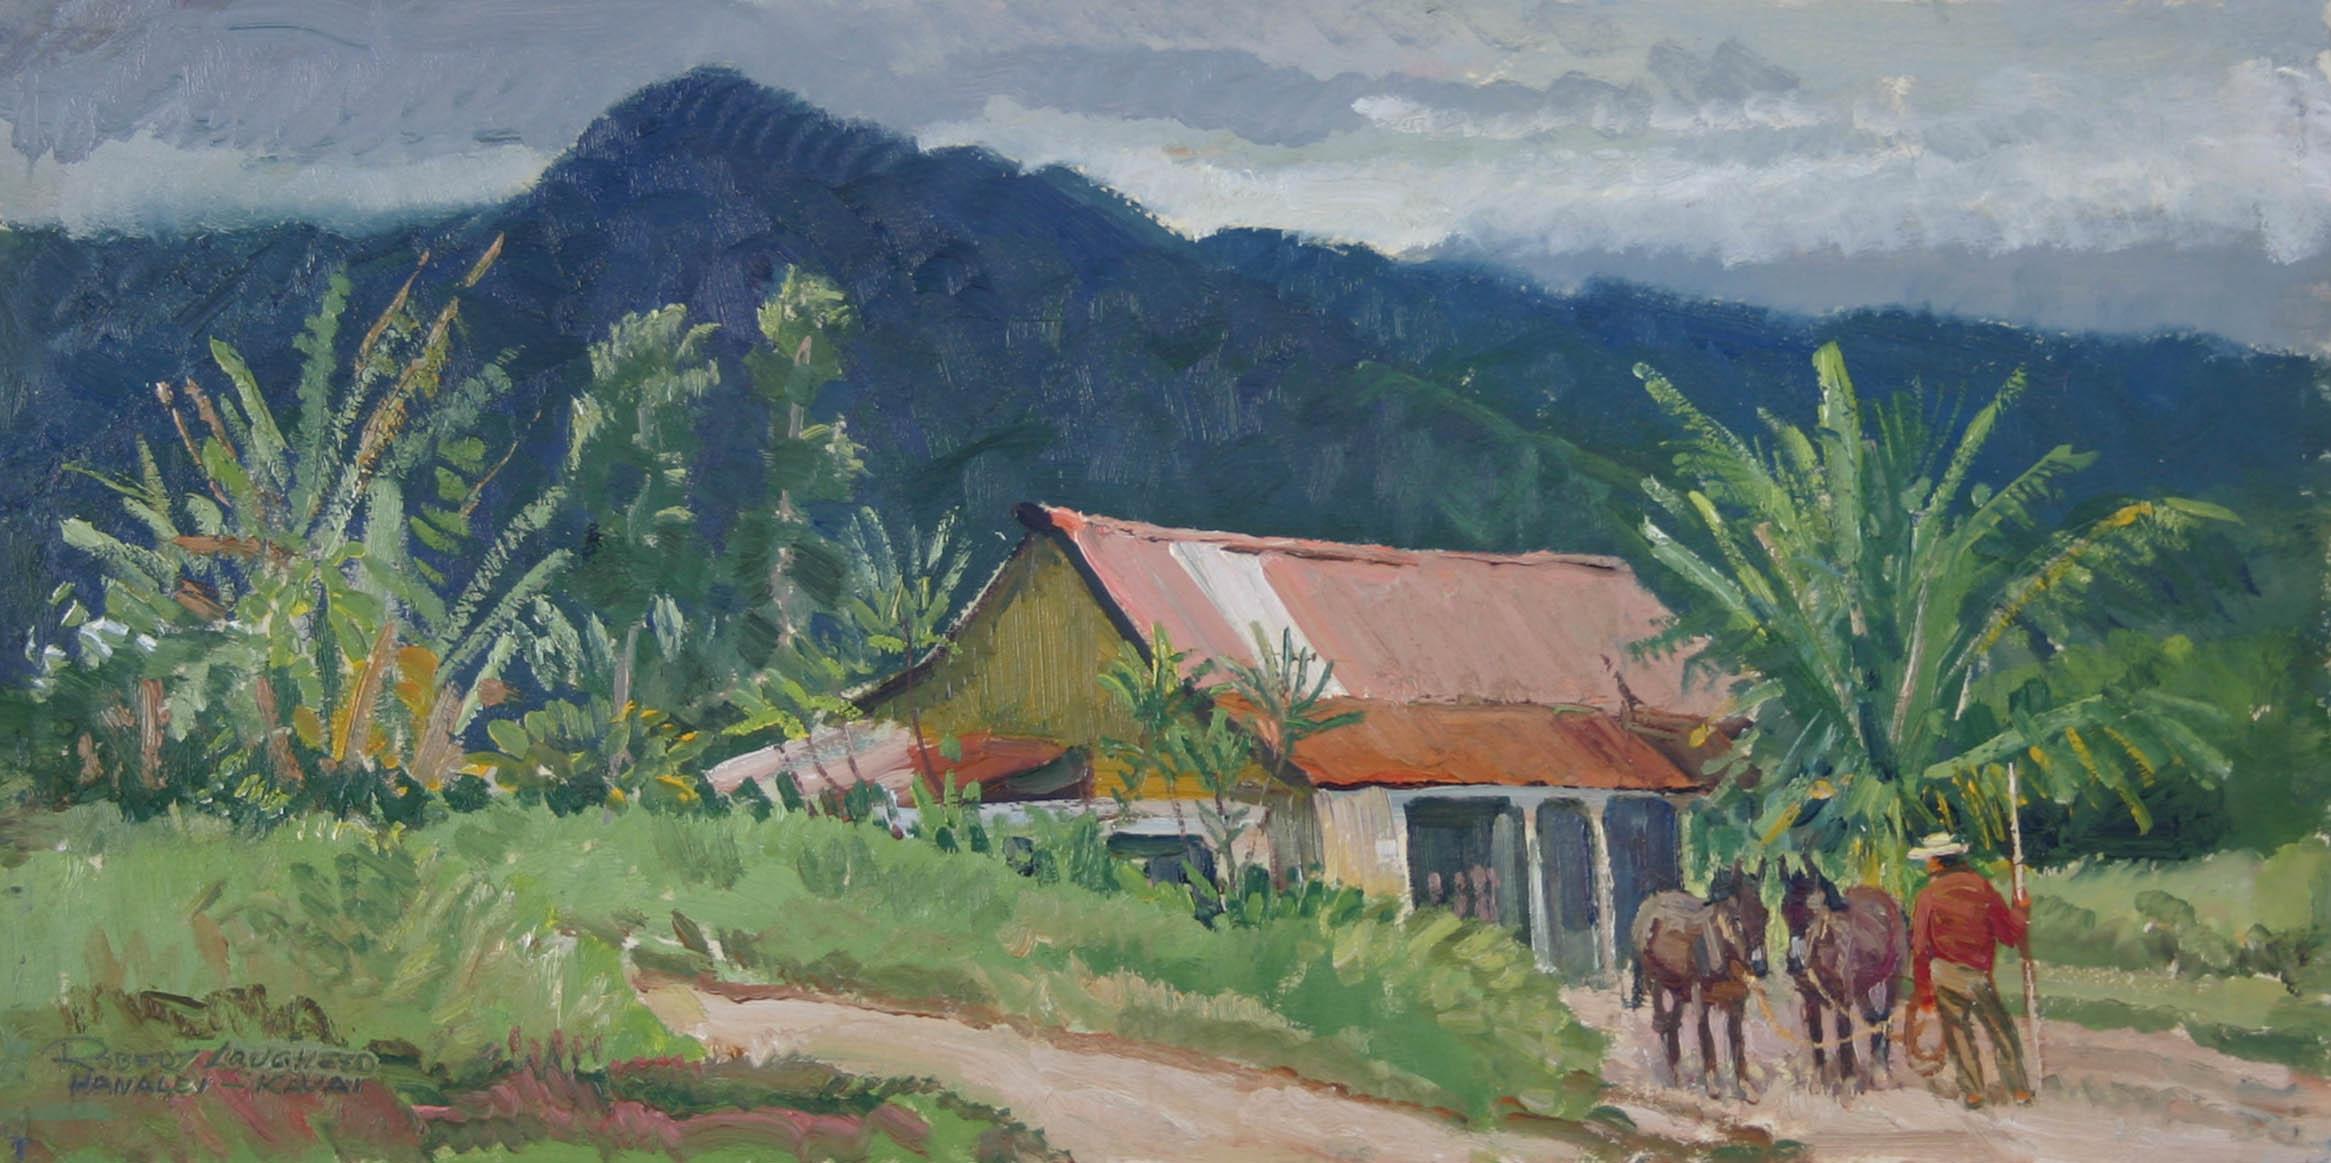 Hanalei Bay, Kauai by  Robert Lougheed - Masterpiece Online